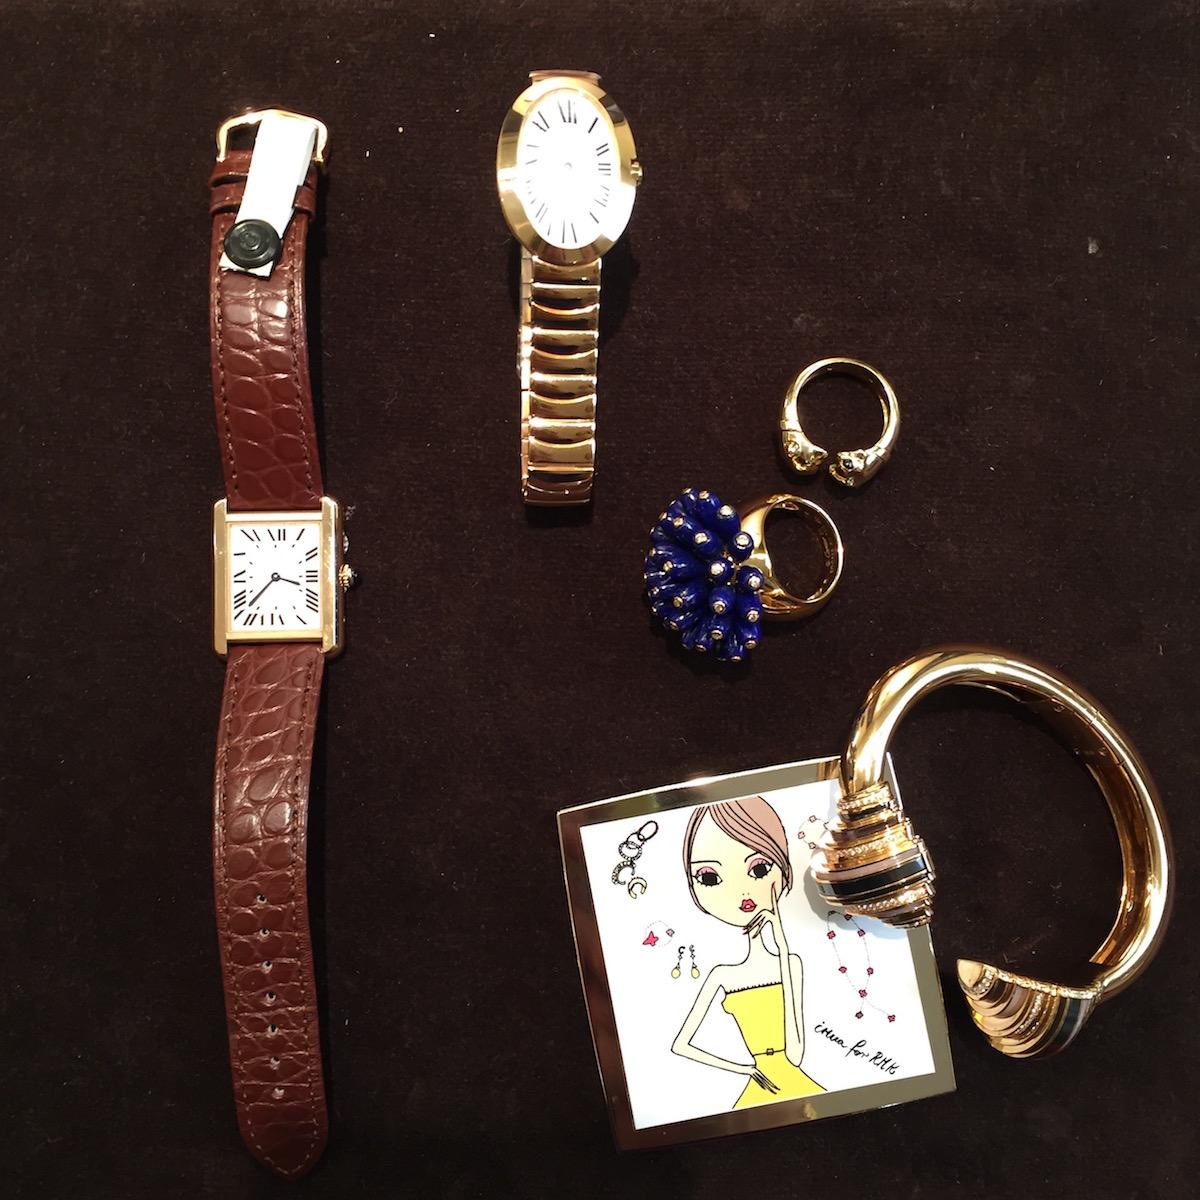 eeef2eca7c4 Jewellery shopping